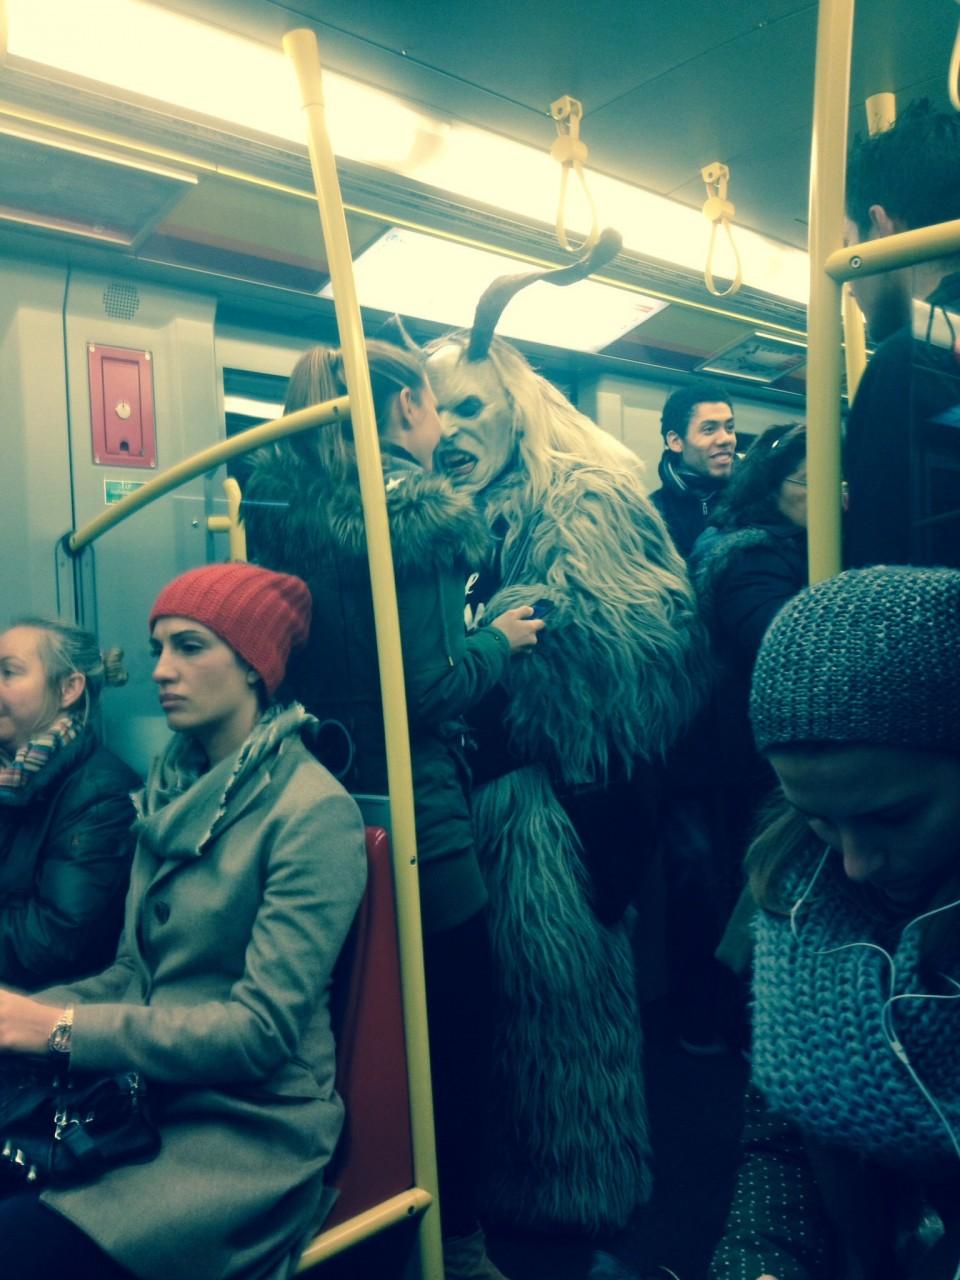 Прижимки в автобусе фото 26 фотография